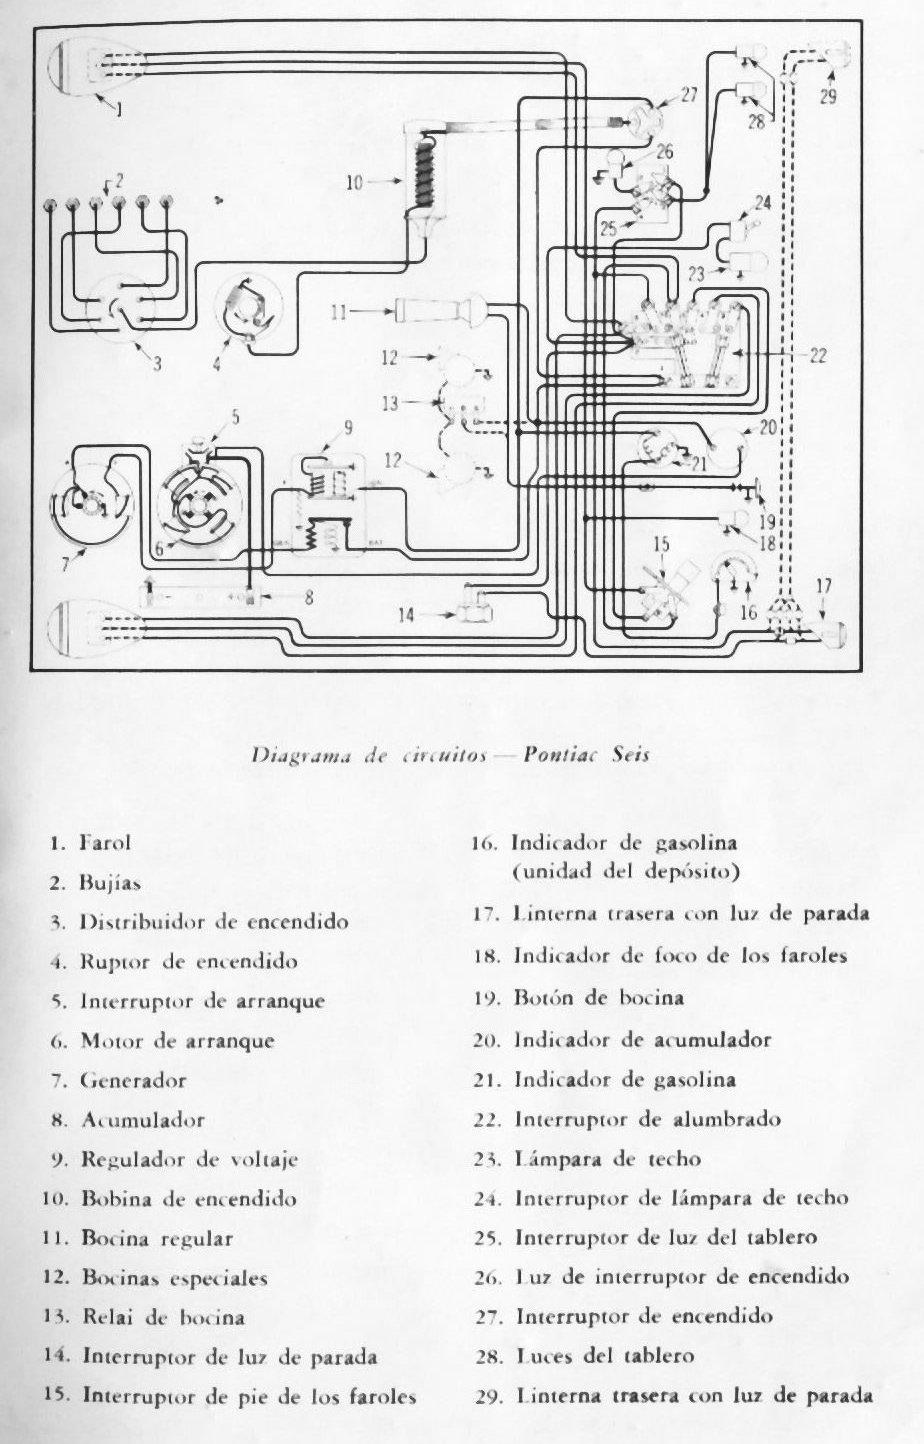 complete wiring diagram of 1960 pontiac